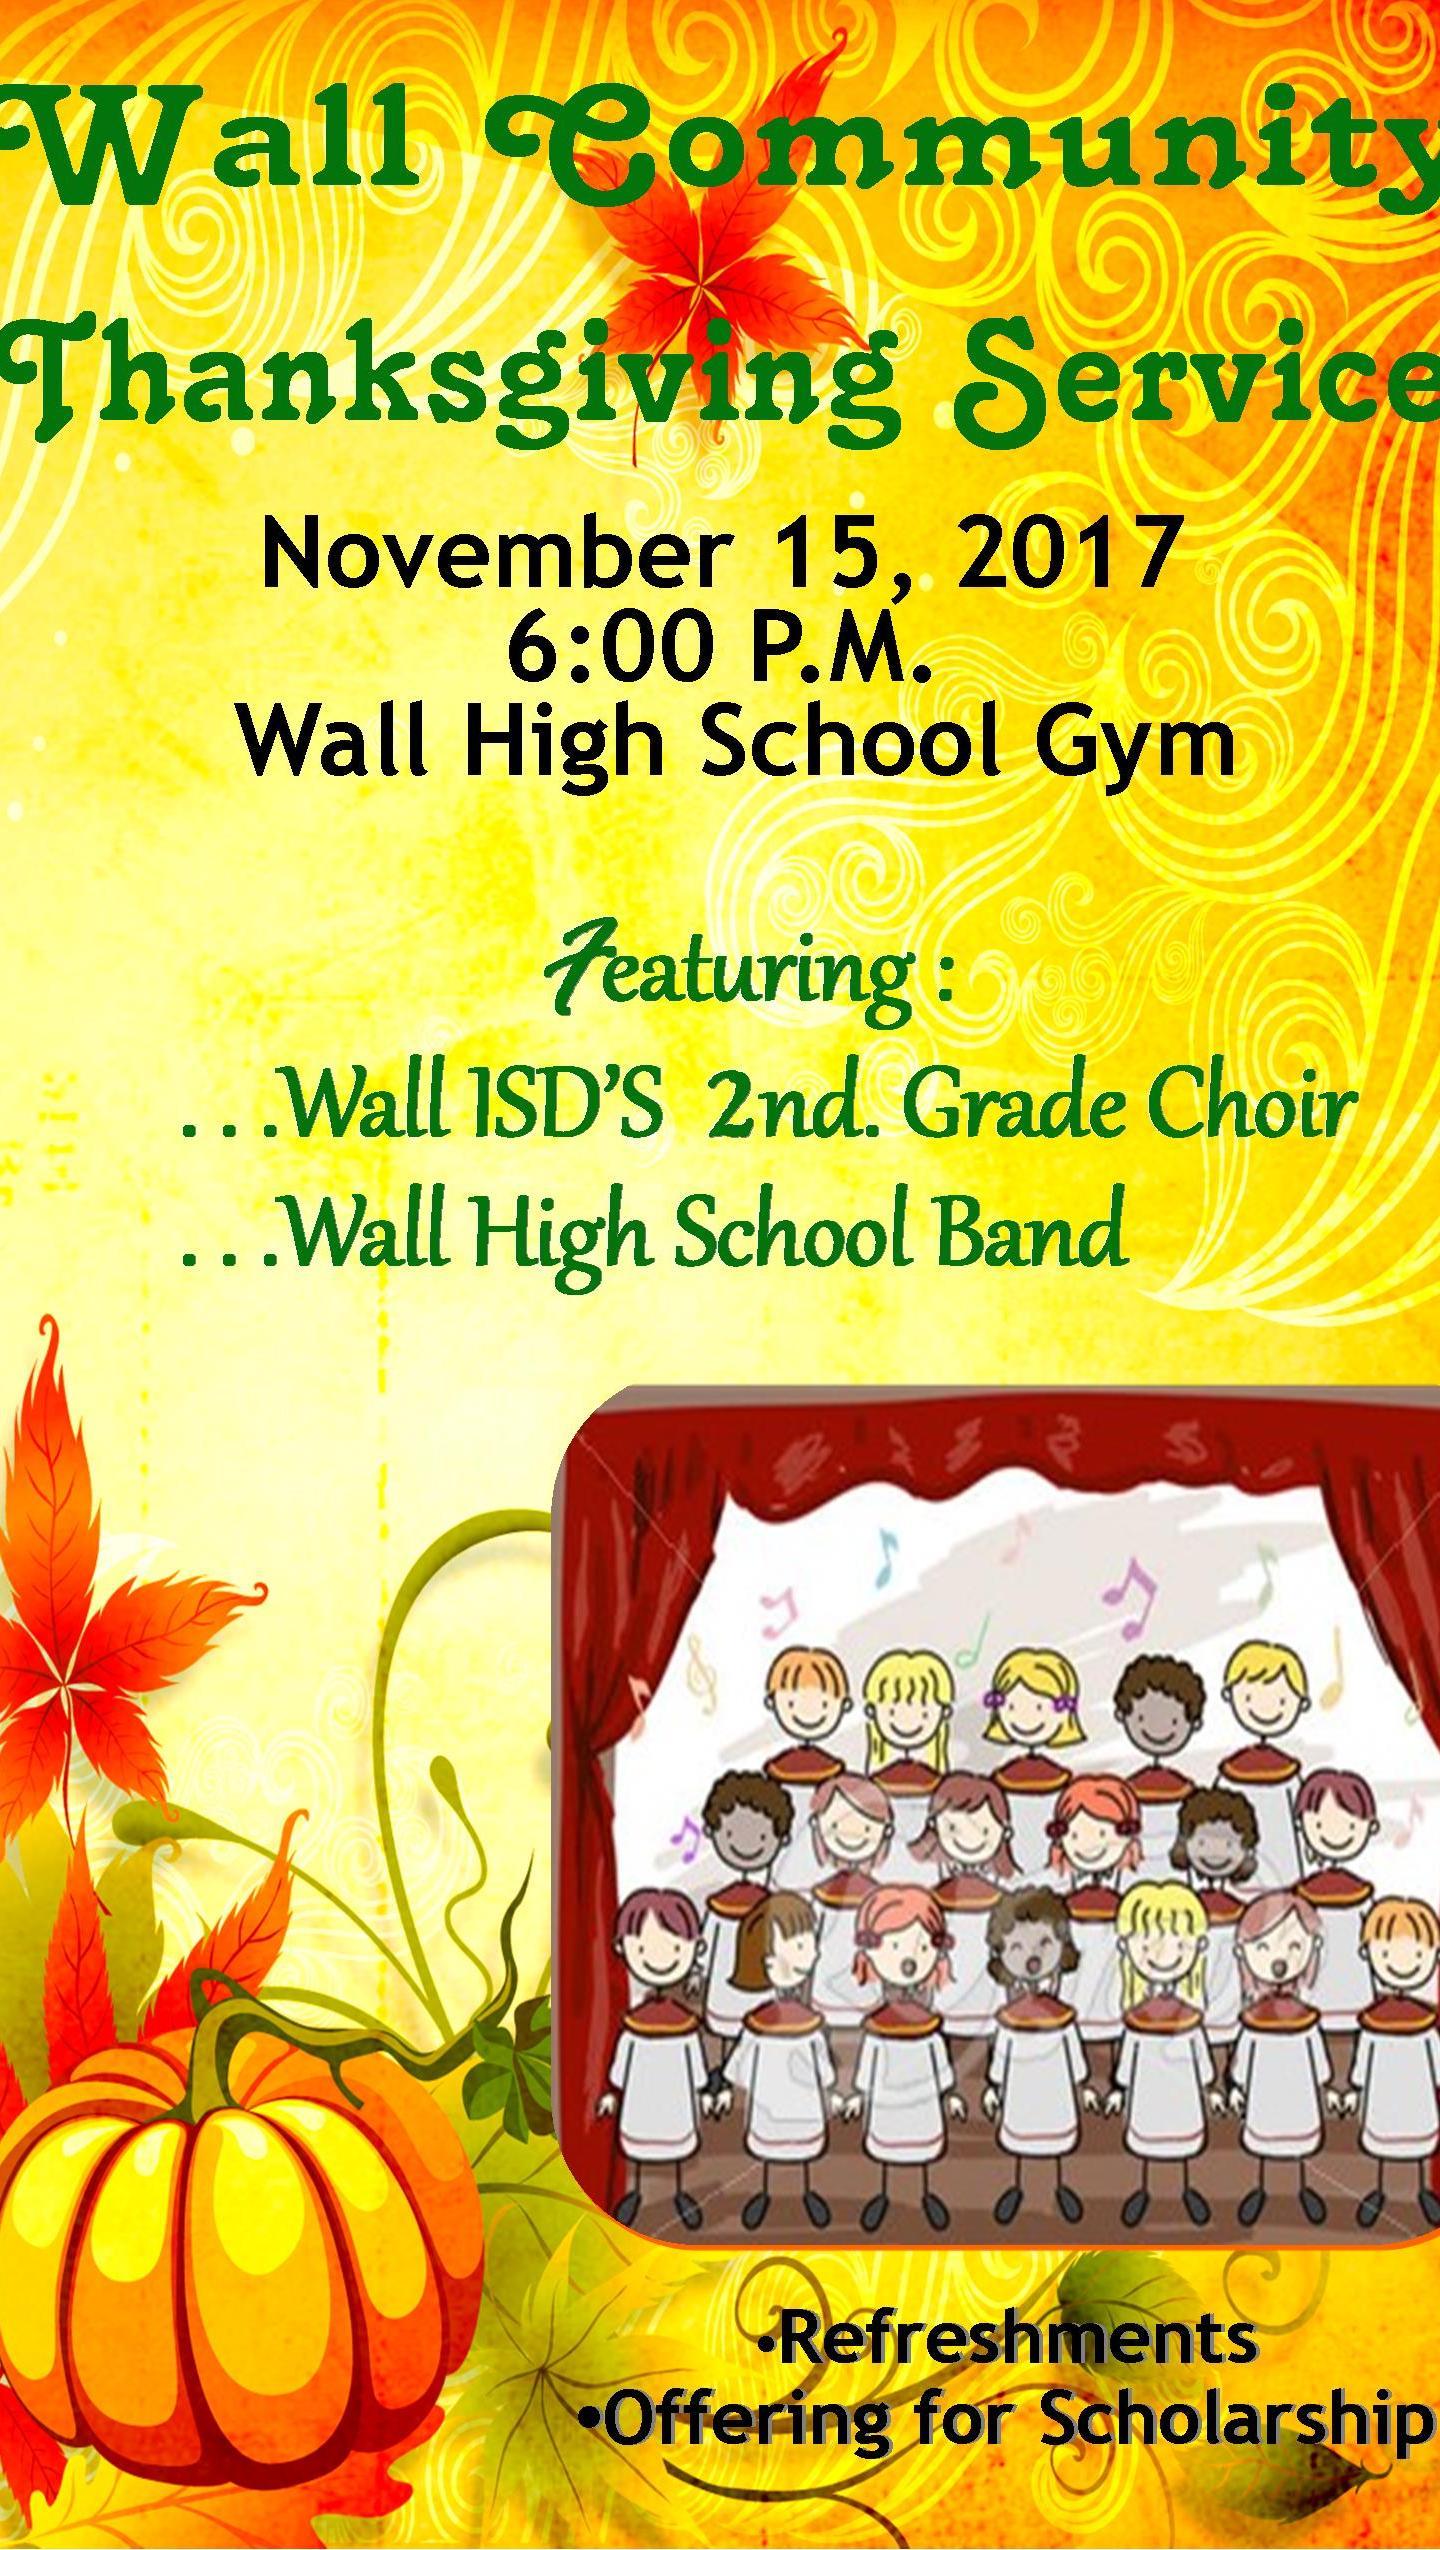 Wall Community Thanksgiving Service _1510691637903.jpg